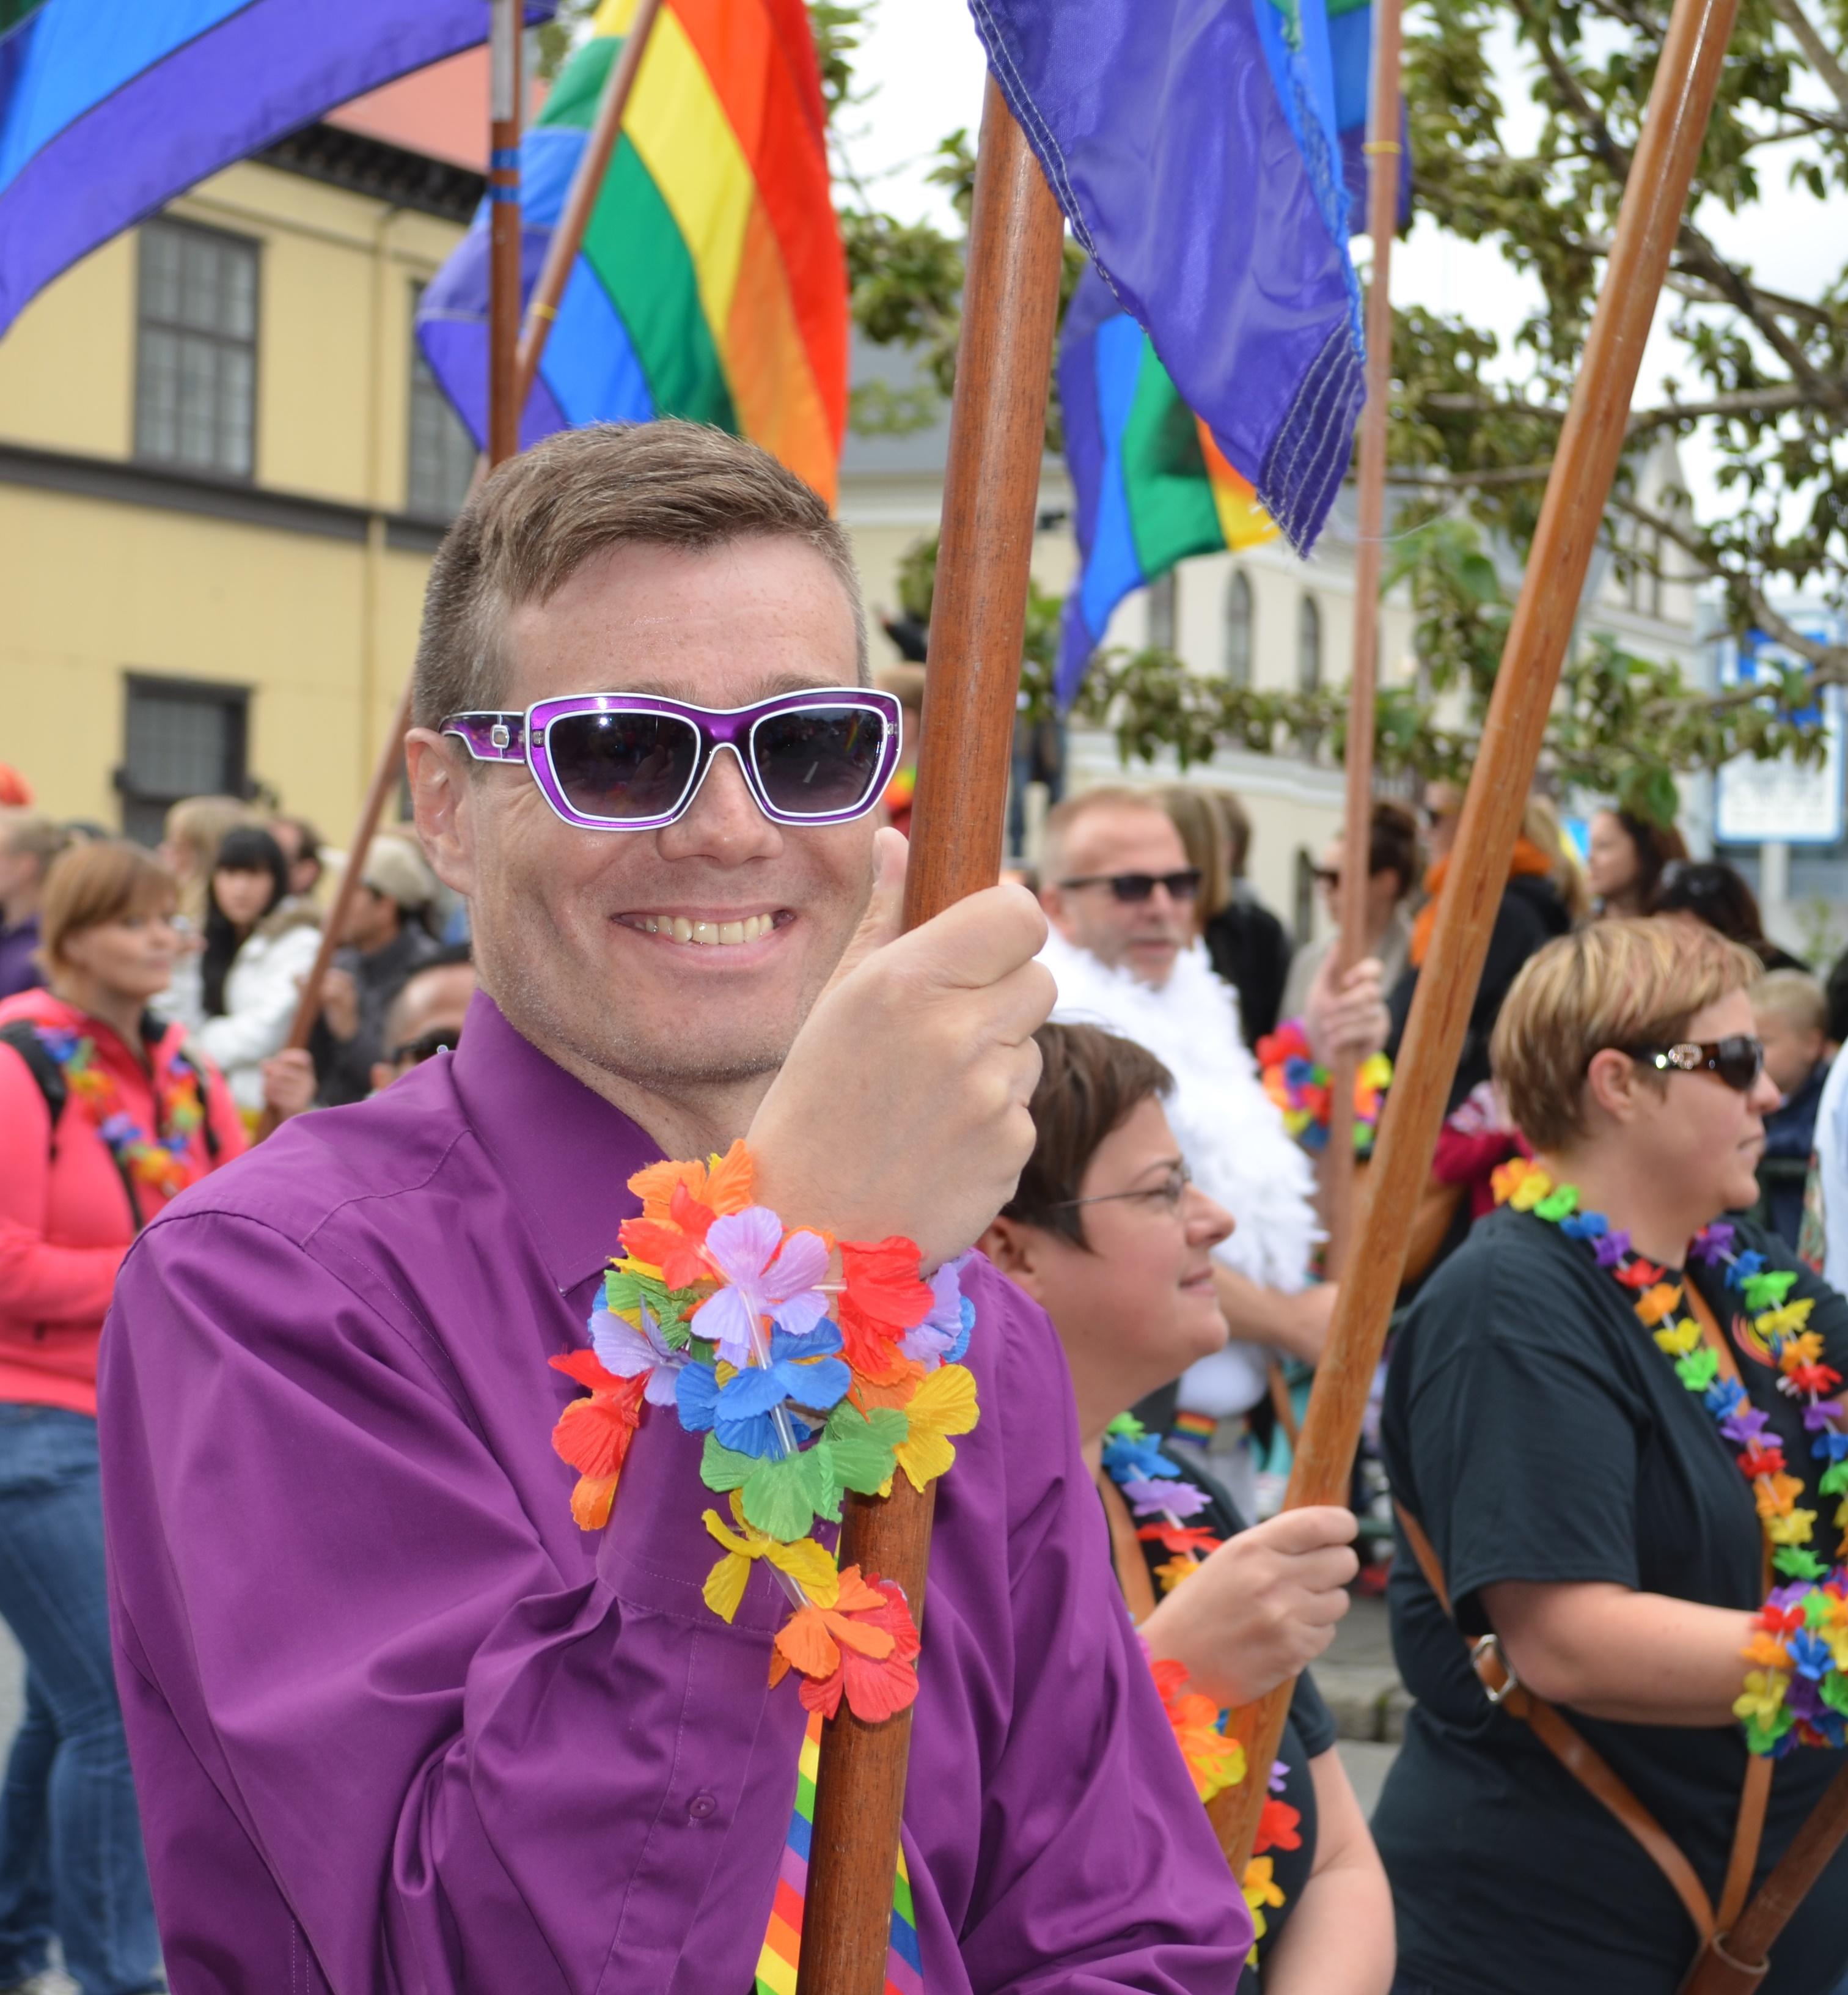 Gay Pride Parades Commemorate Riots - Other - Hot Videos-5605